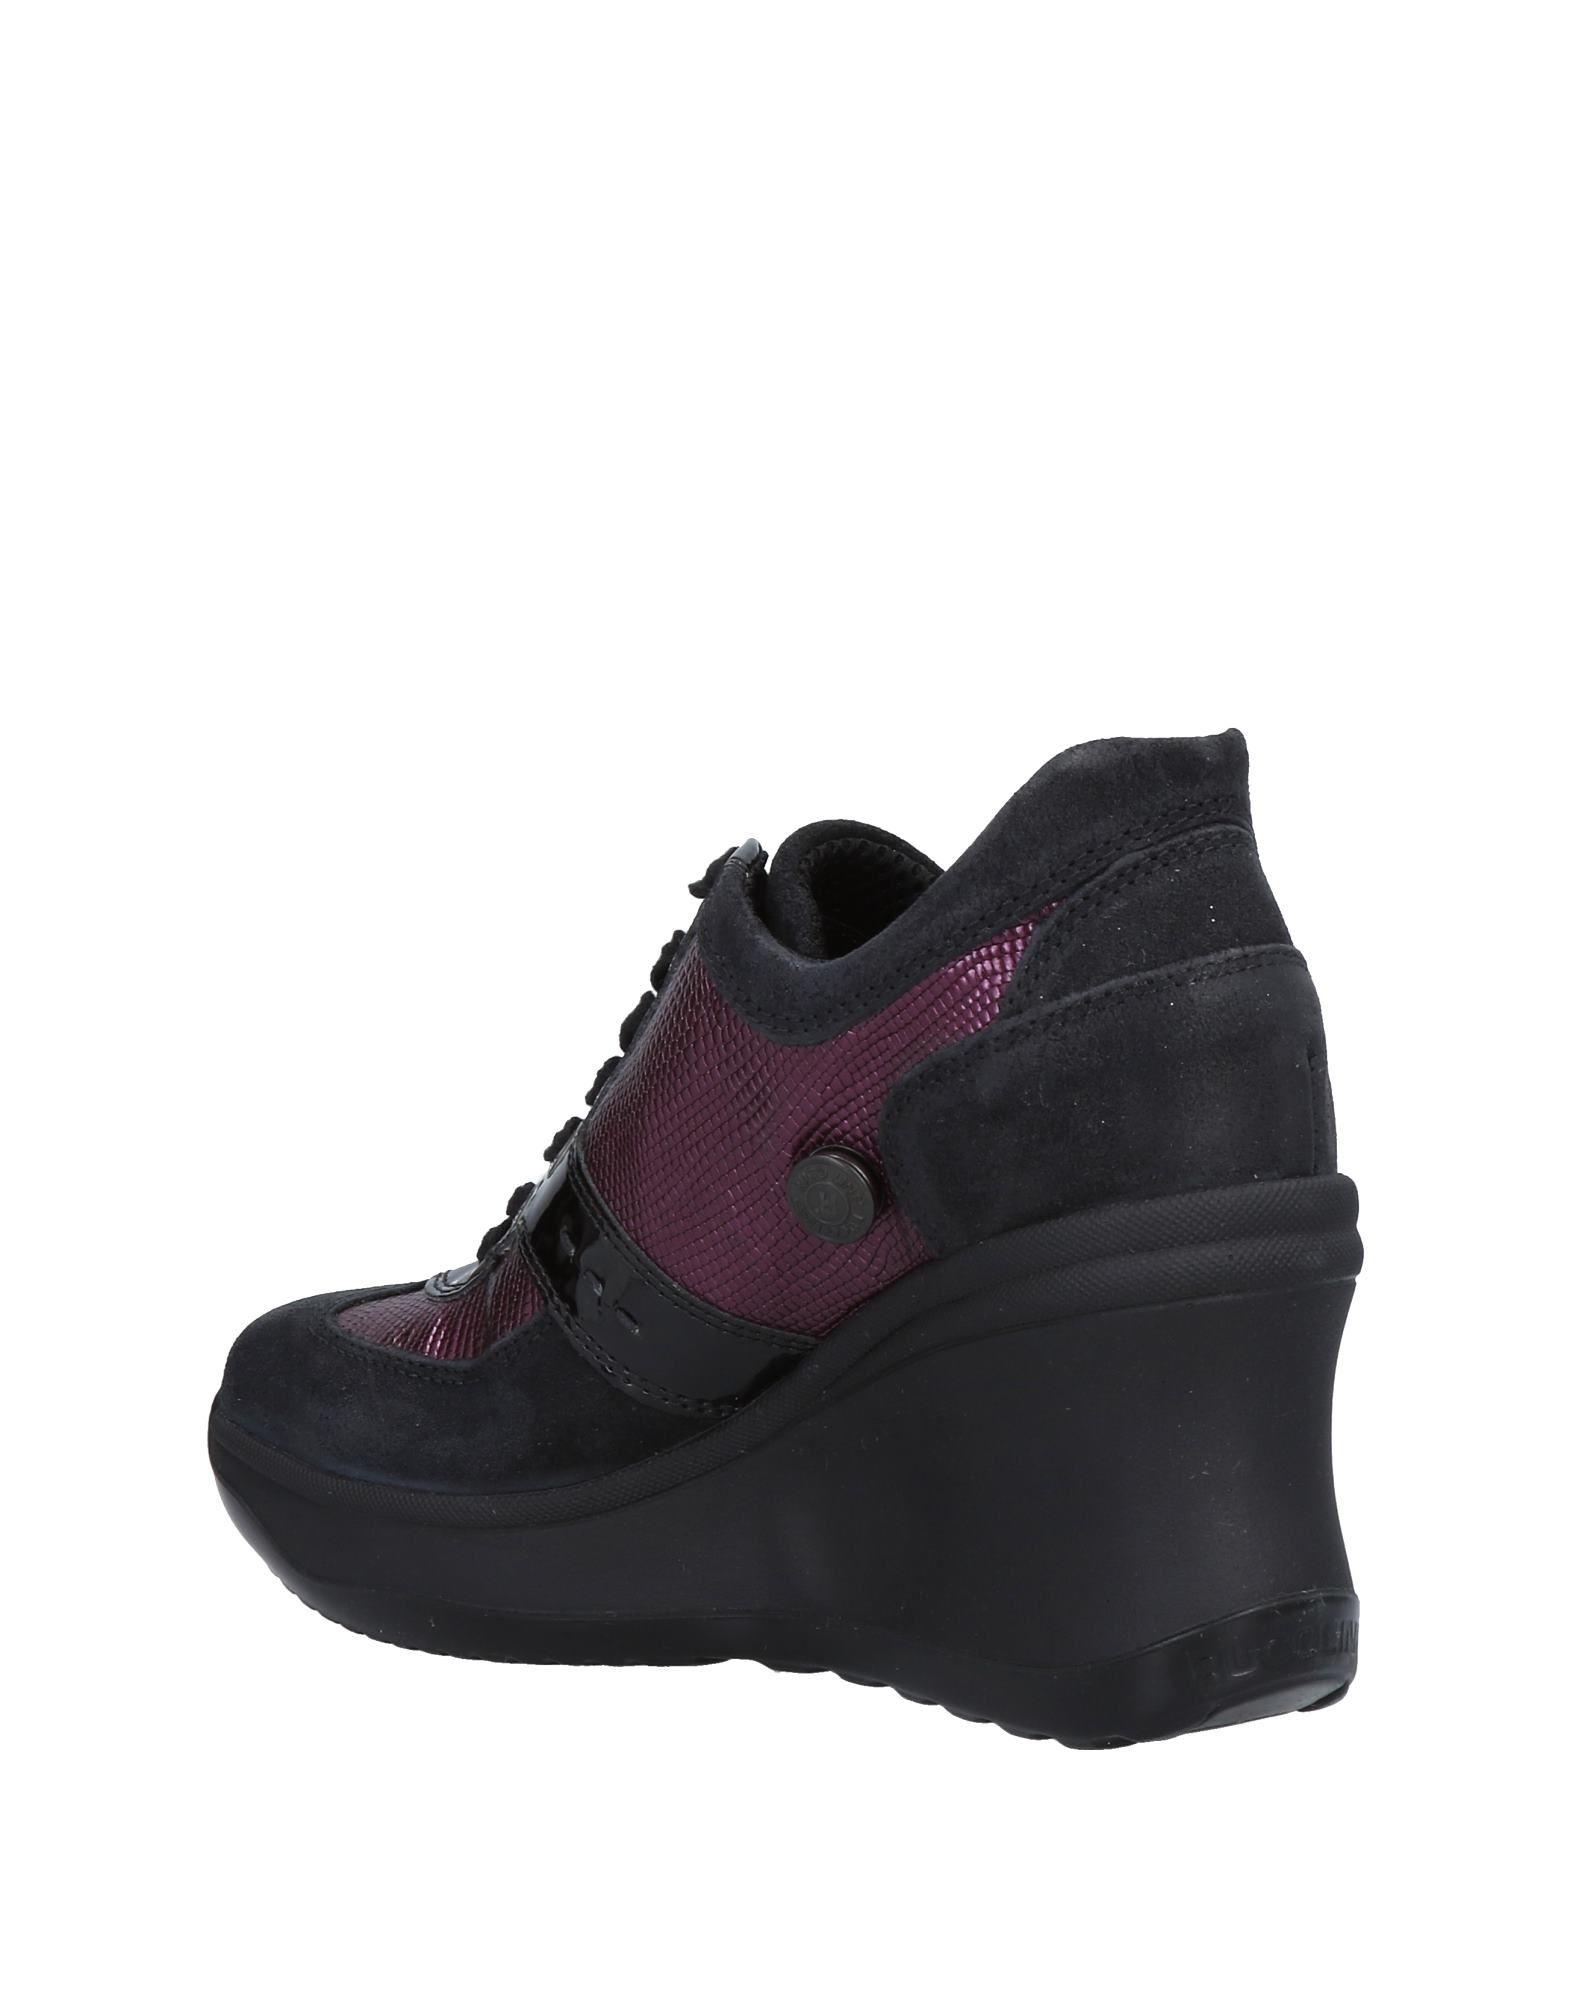 Ruco Line Sneakers Gutes Damen Gutes Sneakers Preis-Leistungs-Verhältnis, es lohnt sich d9e25f